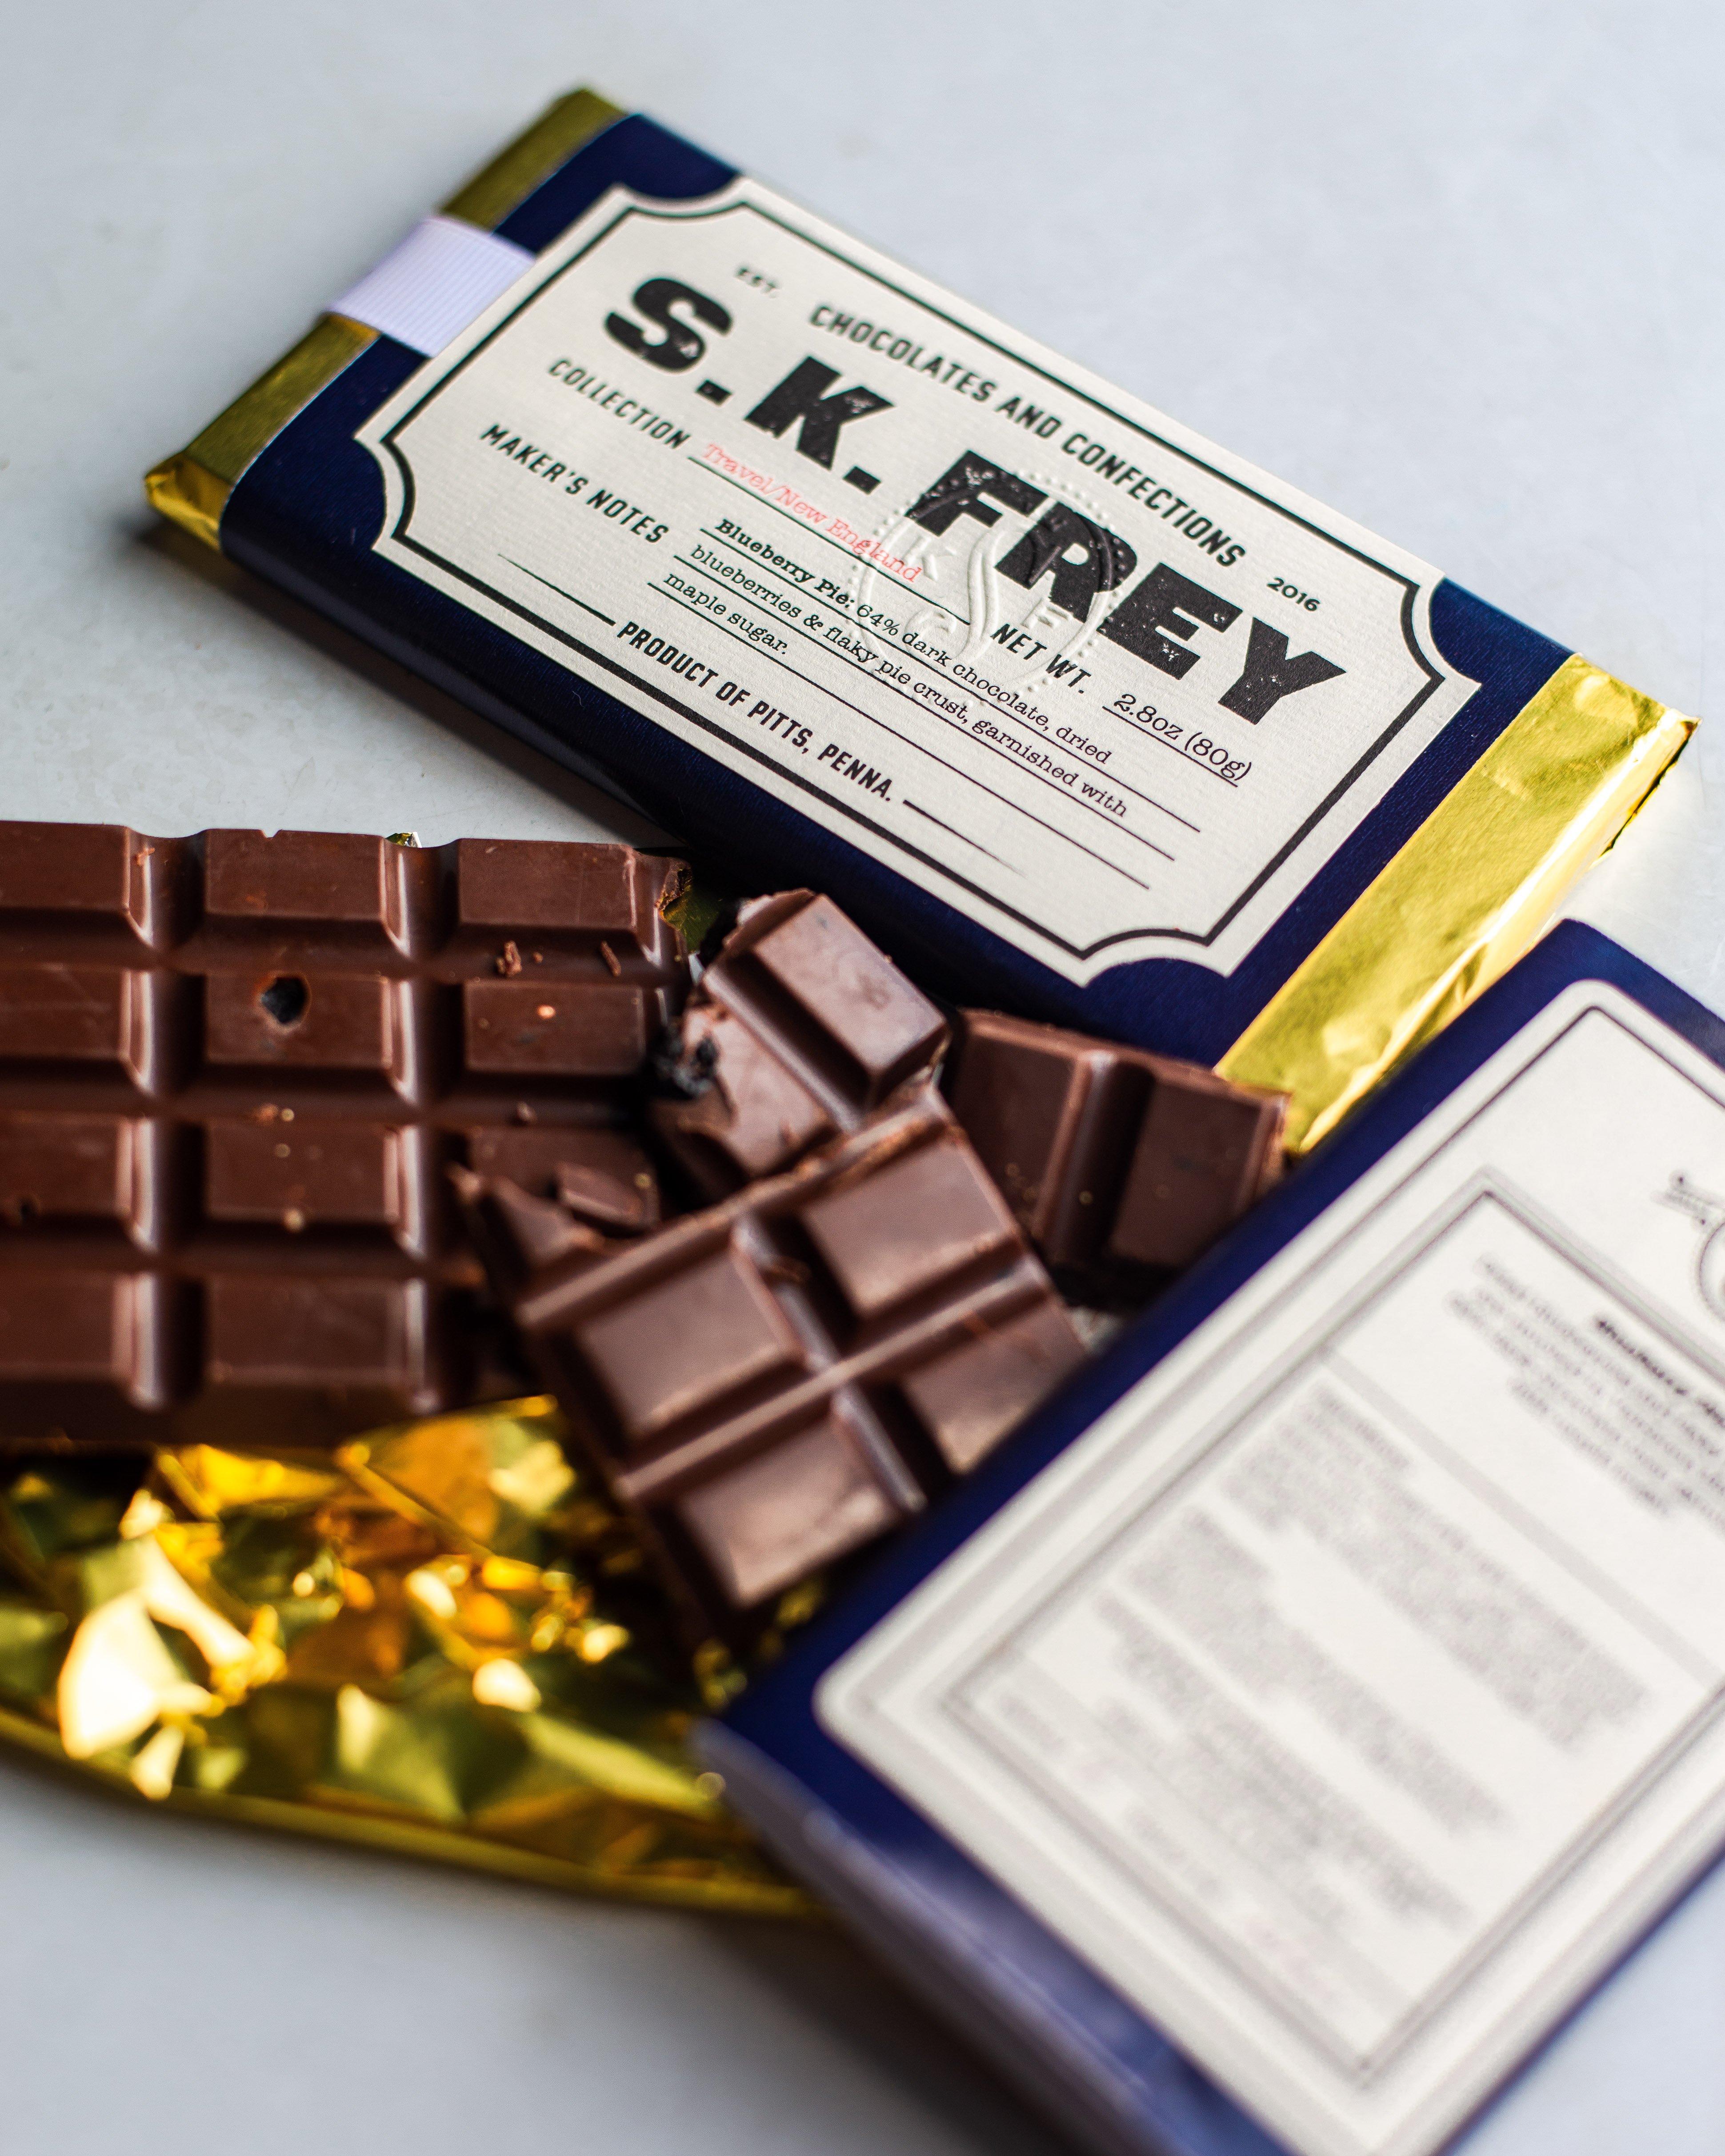 Travel Series Chocolate Bar - S.K. Frey Chocolates & Confections